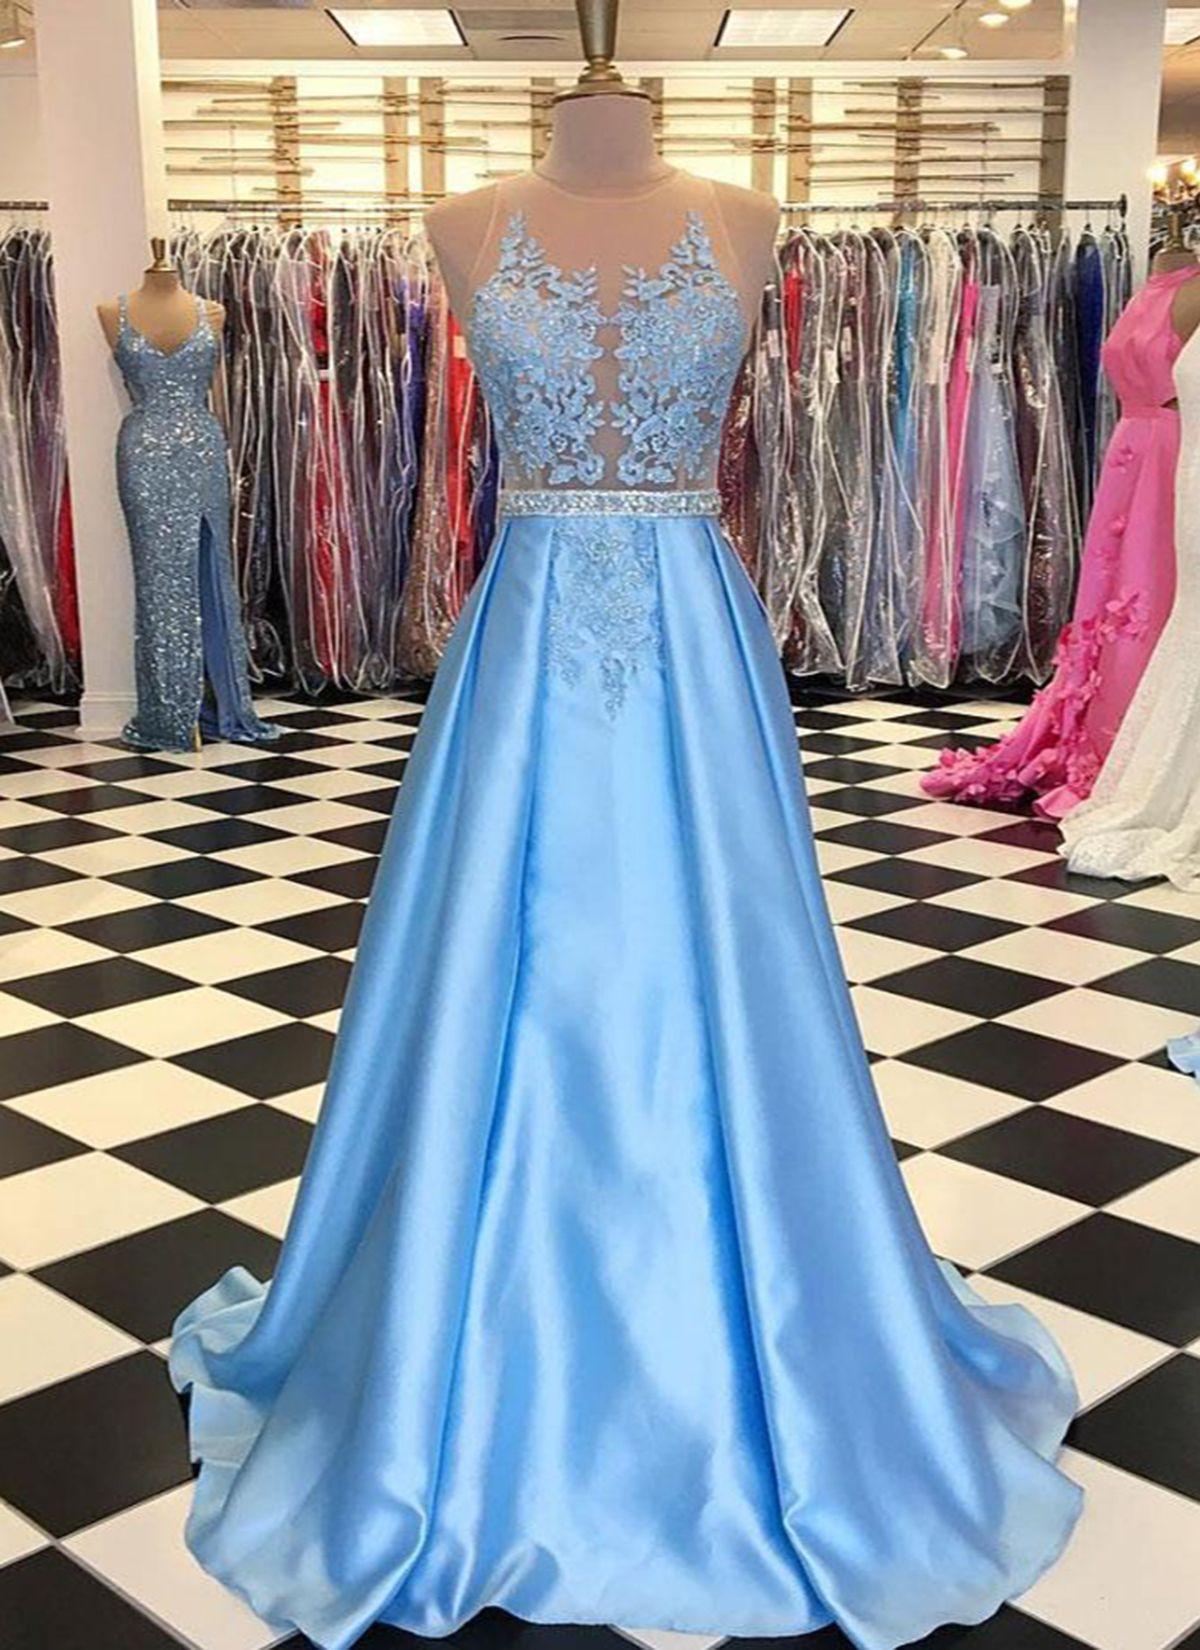 Mermaid Sweetheart Strapless Drop Waist Satin Prom Dress